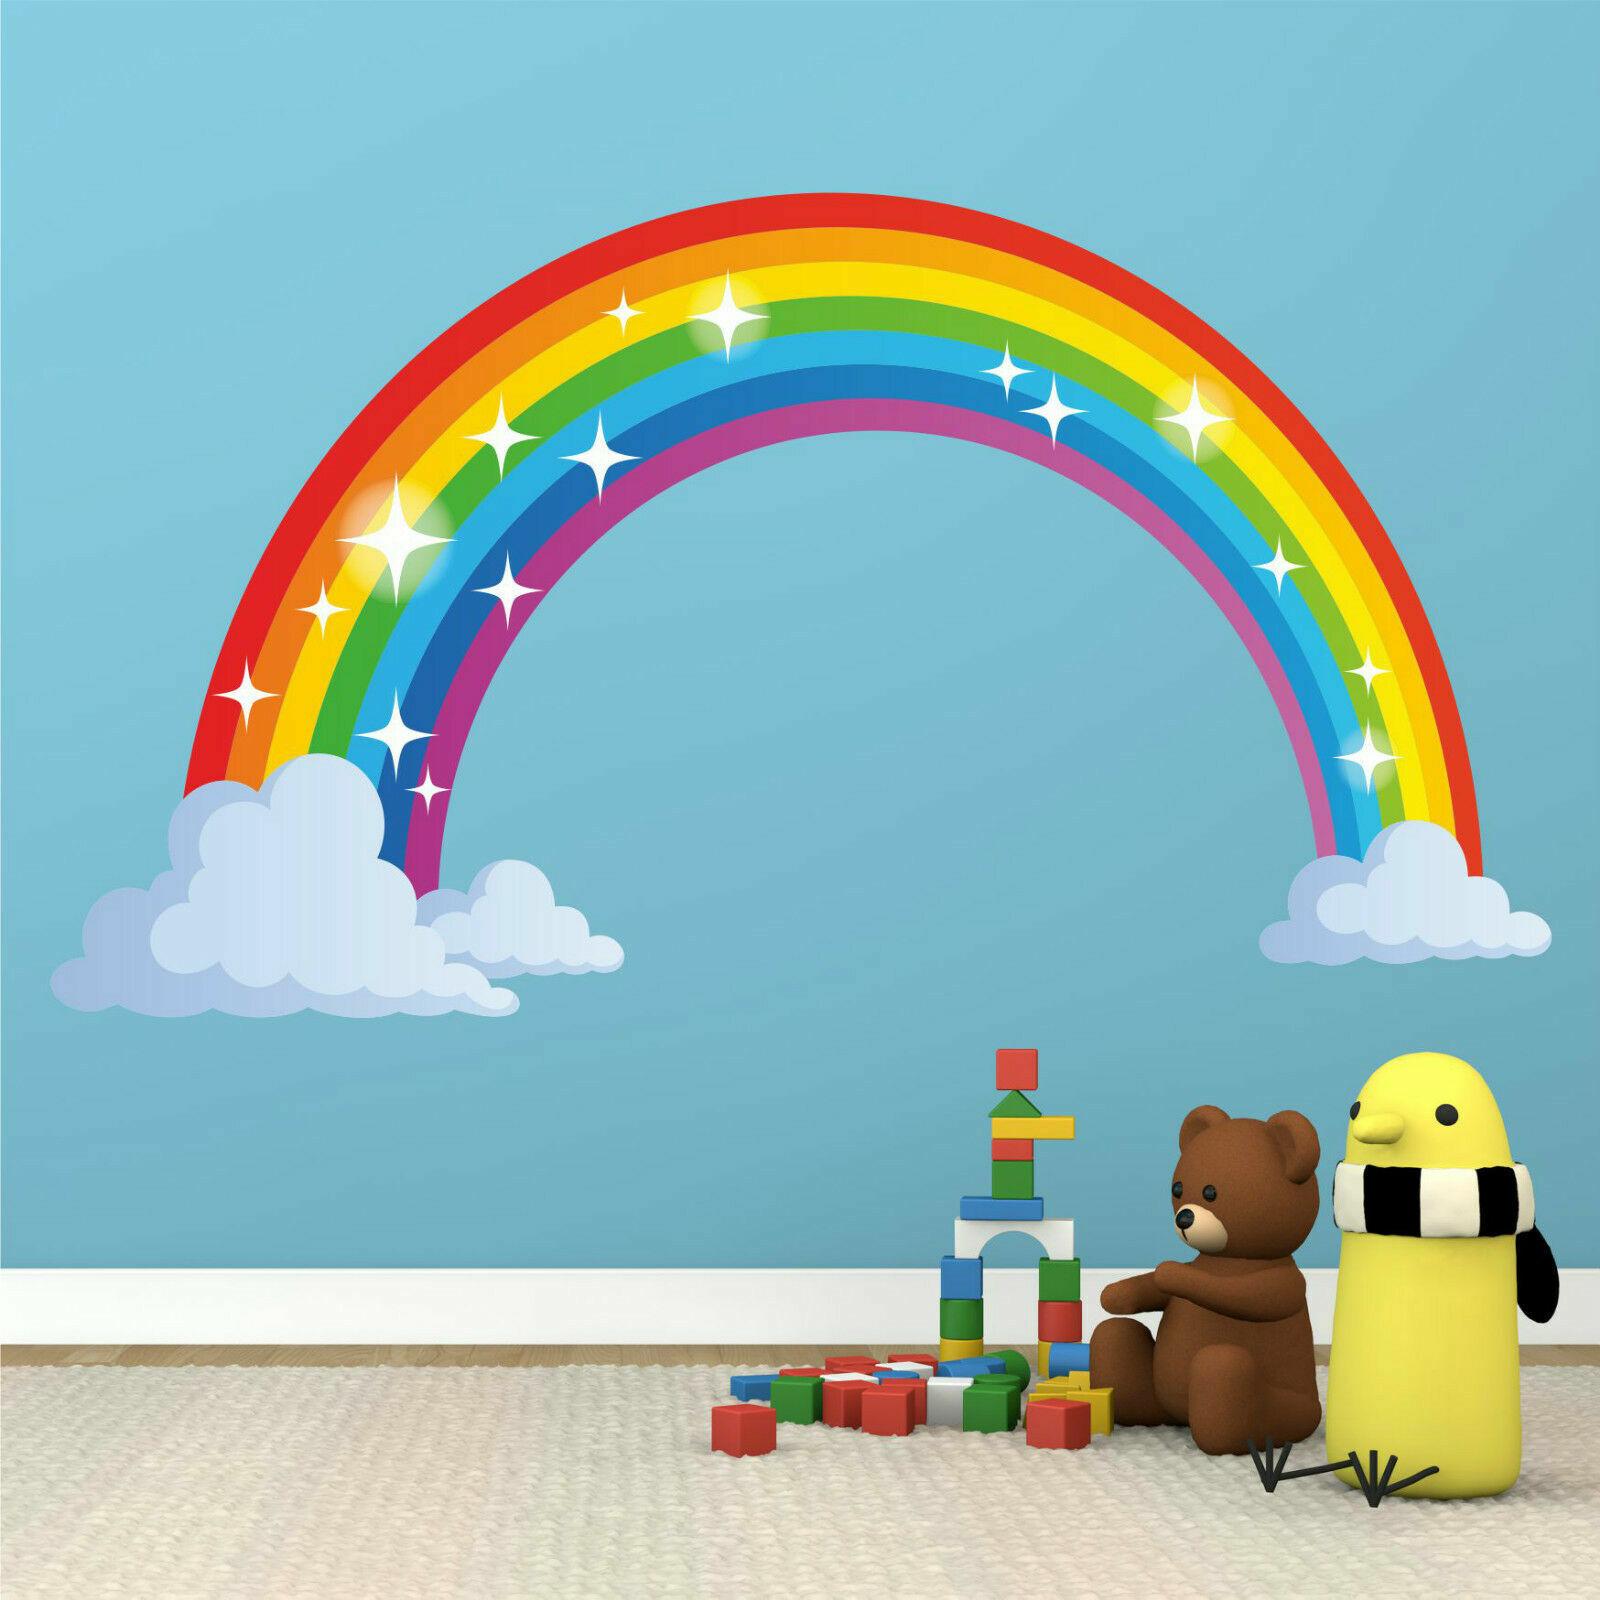 Rainbow Wall Stickers Kids Child Bedroom Nursery Decals Home Decor Stylis BJvt